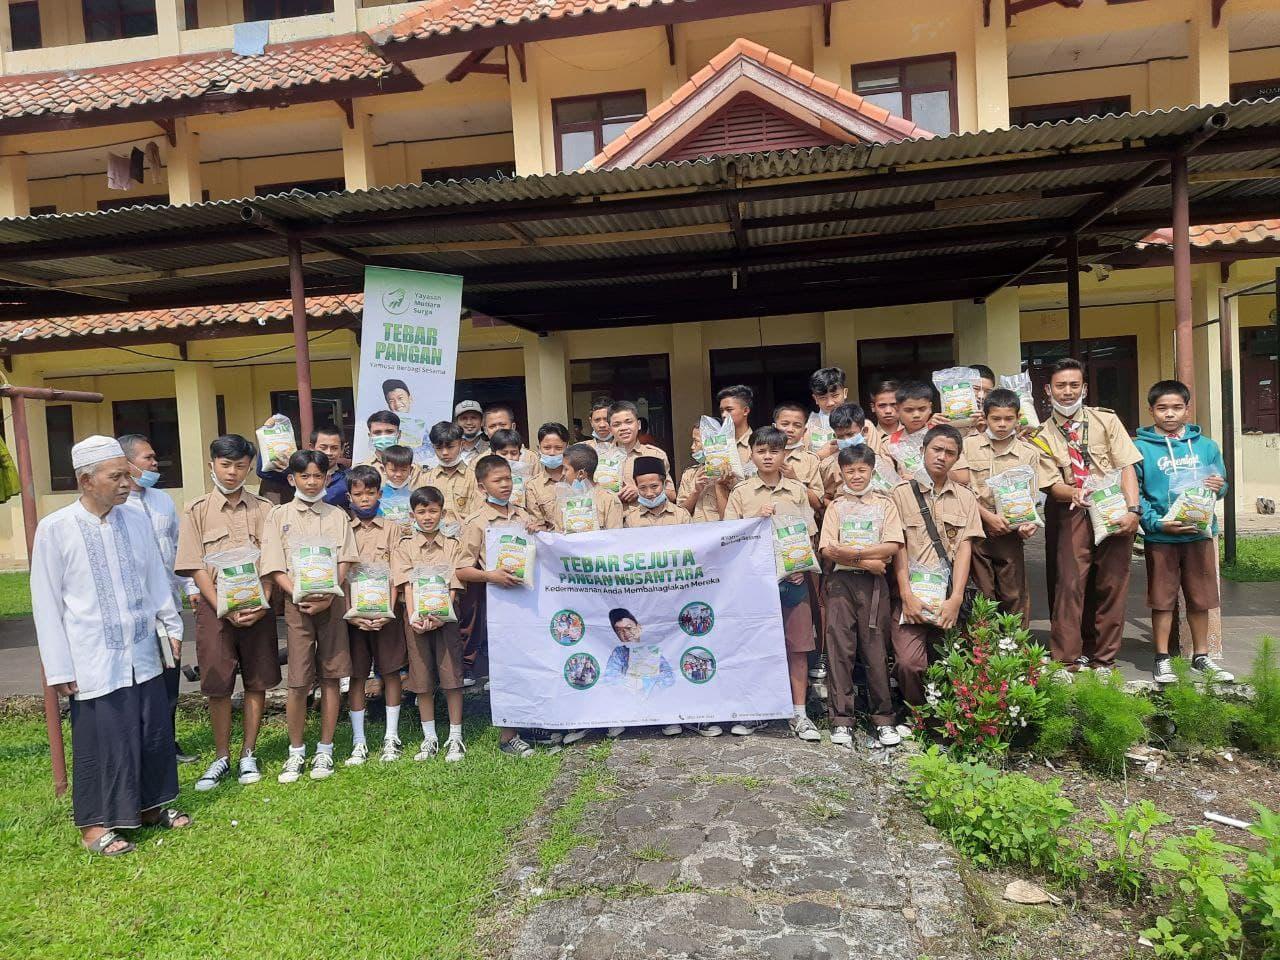 Paket Pangan untuk Sekolah Ponpes Pambudi Luhur Pamijahan Kab.Bogor